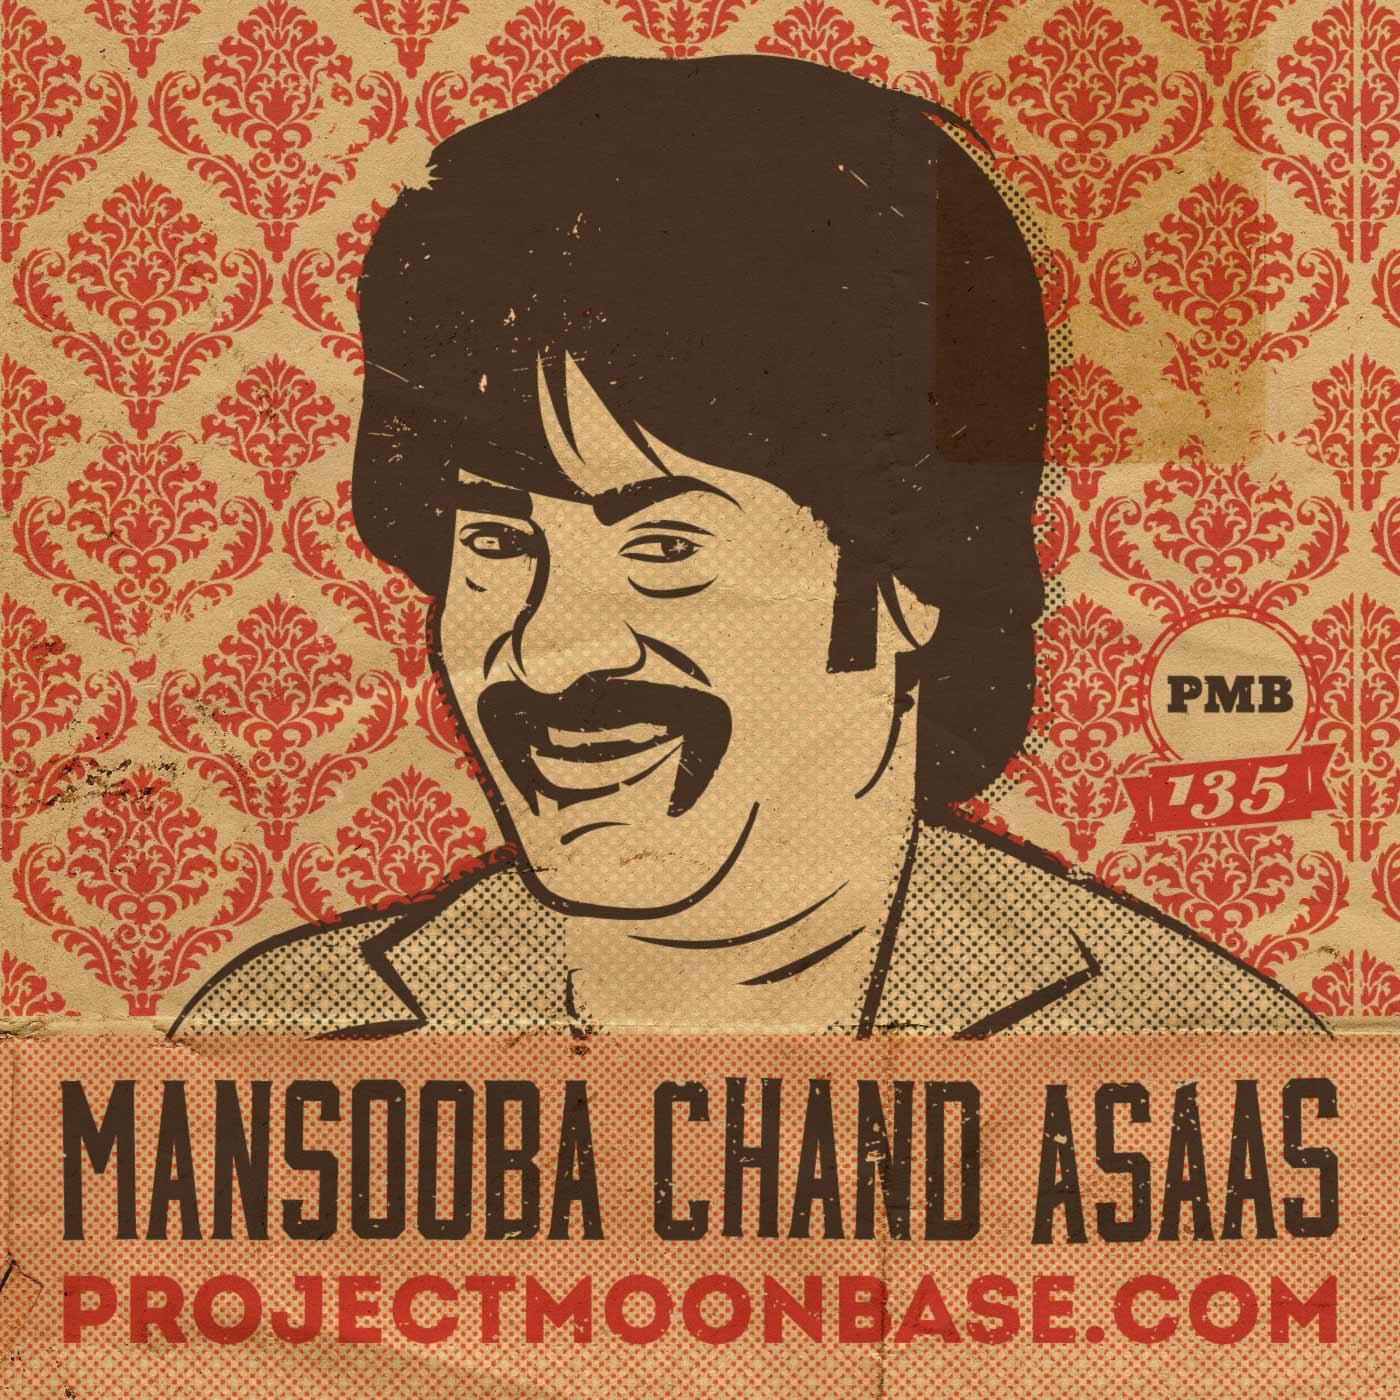 PMB135: Mansooba Chand Asaas